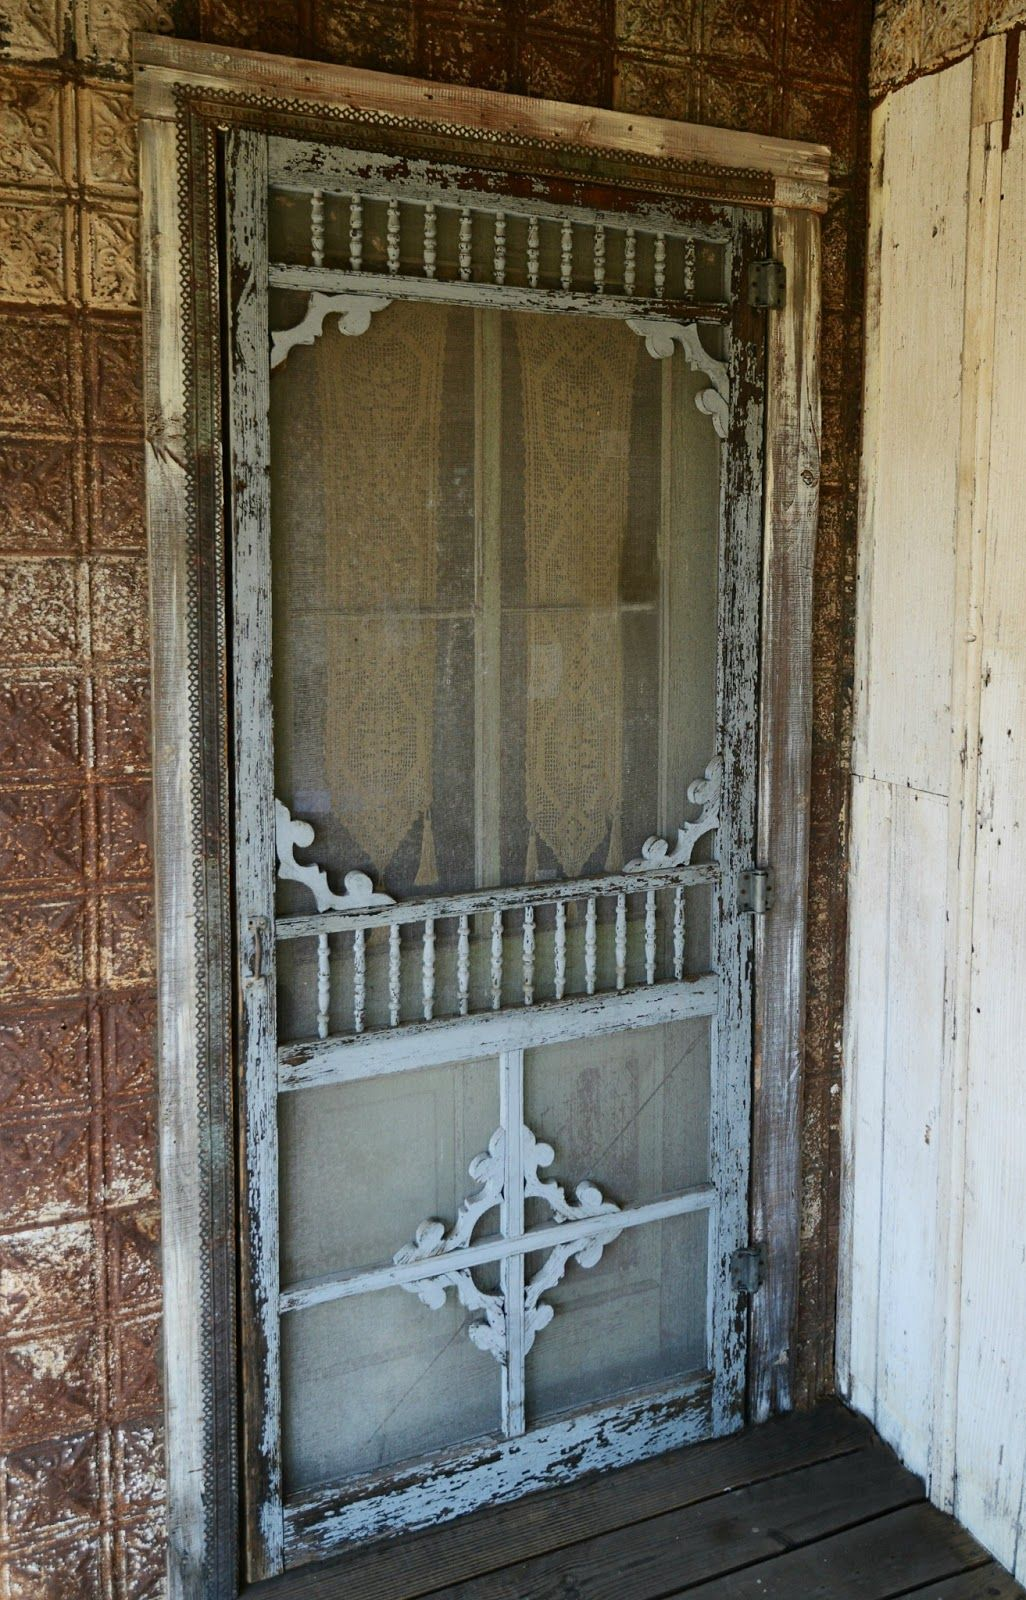 This Old Screen Door At The Magnolia Pearl Ranch In Bandera Texas